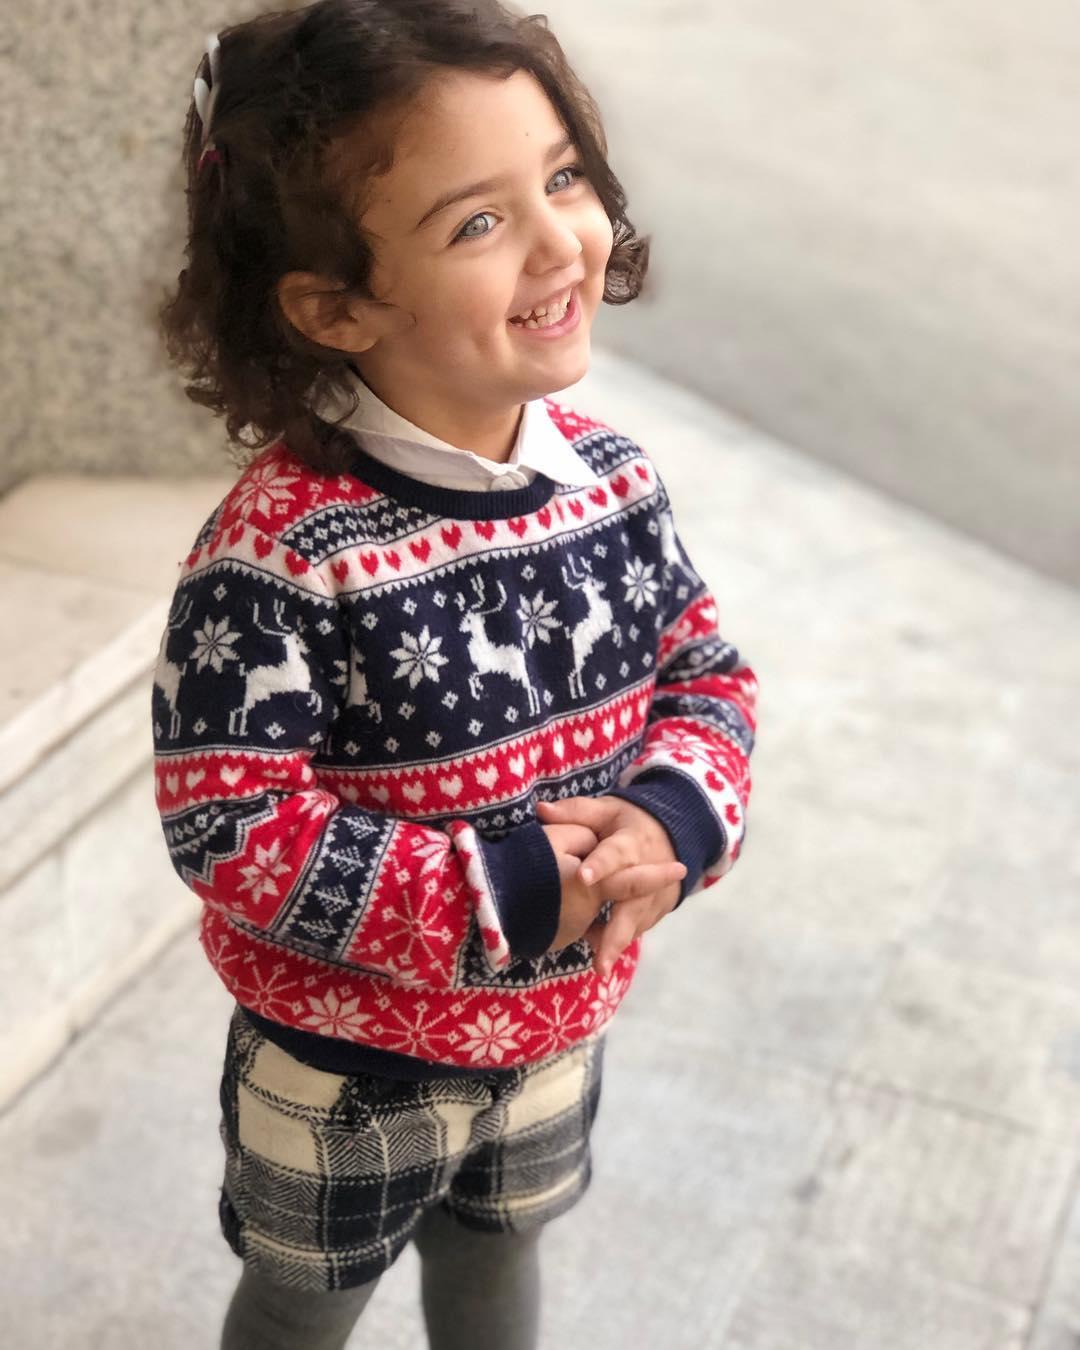 Anahita Hashemzade Cute Girl inThe World - Sonu Teach Guru